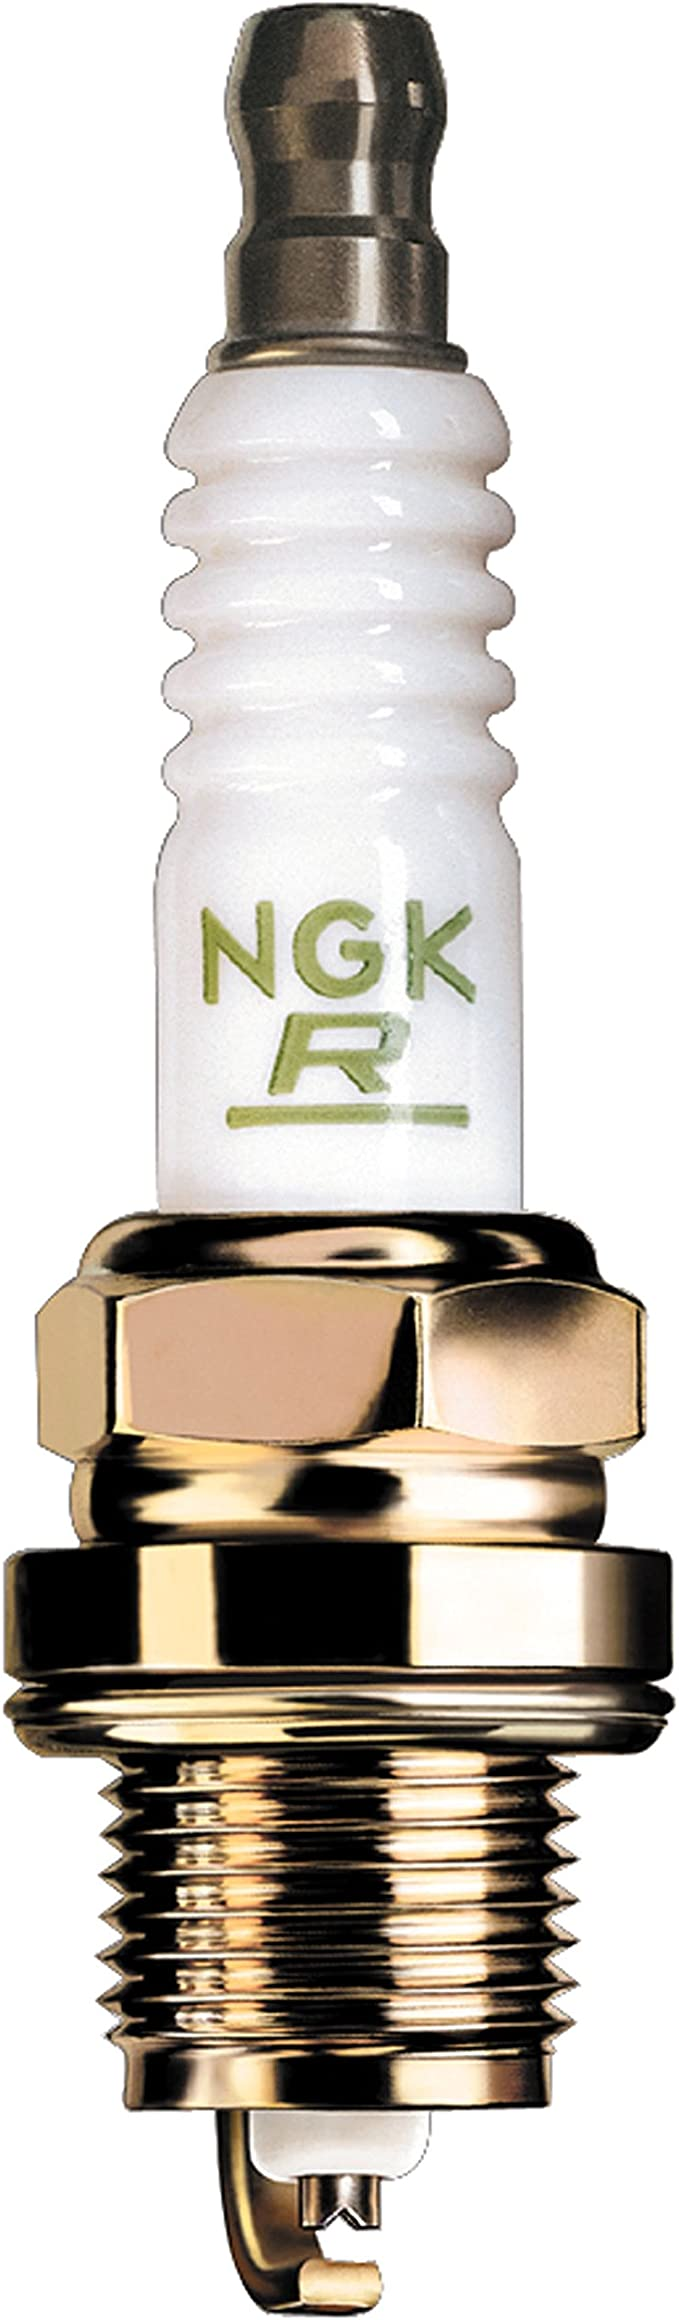 Screw Tip Standard Spark Plugs by NGK B6HS 4 Pack Stock #7534